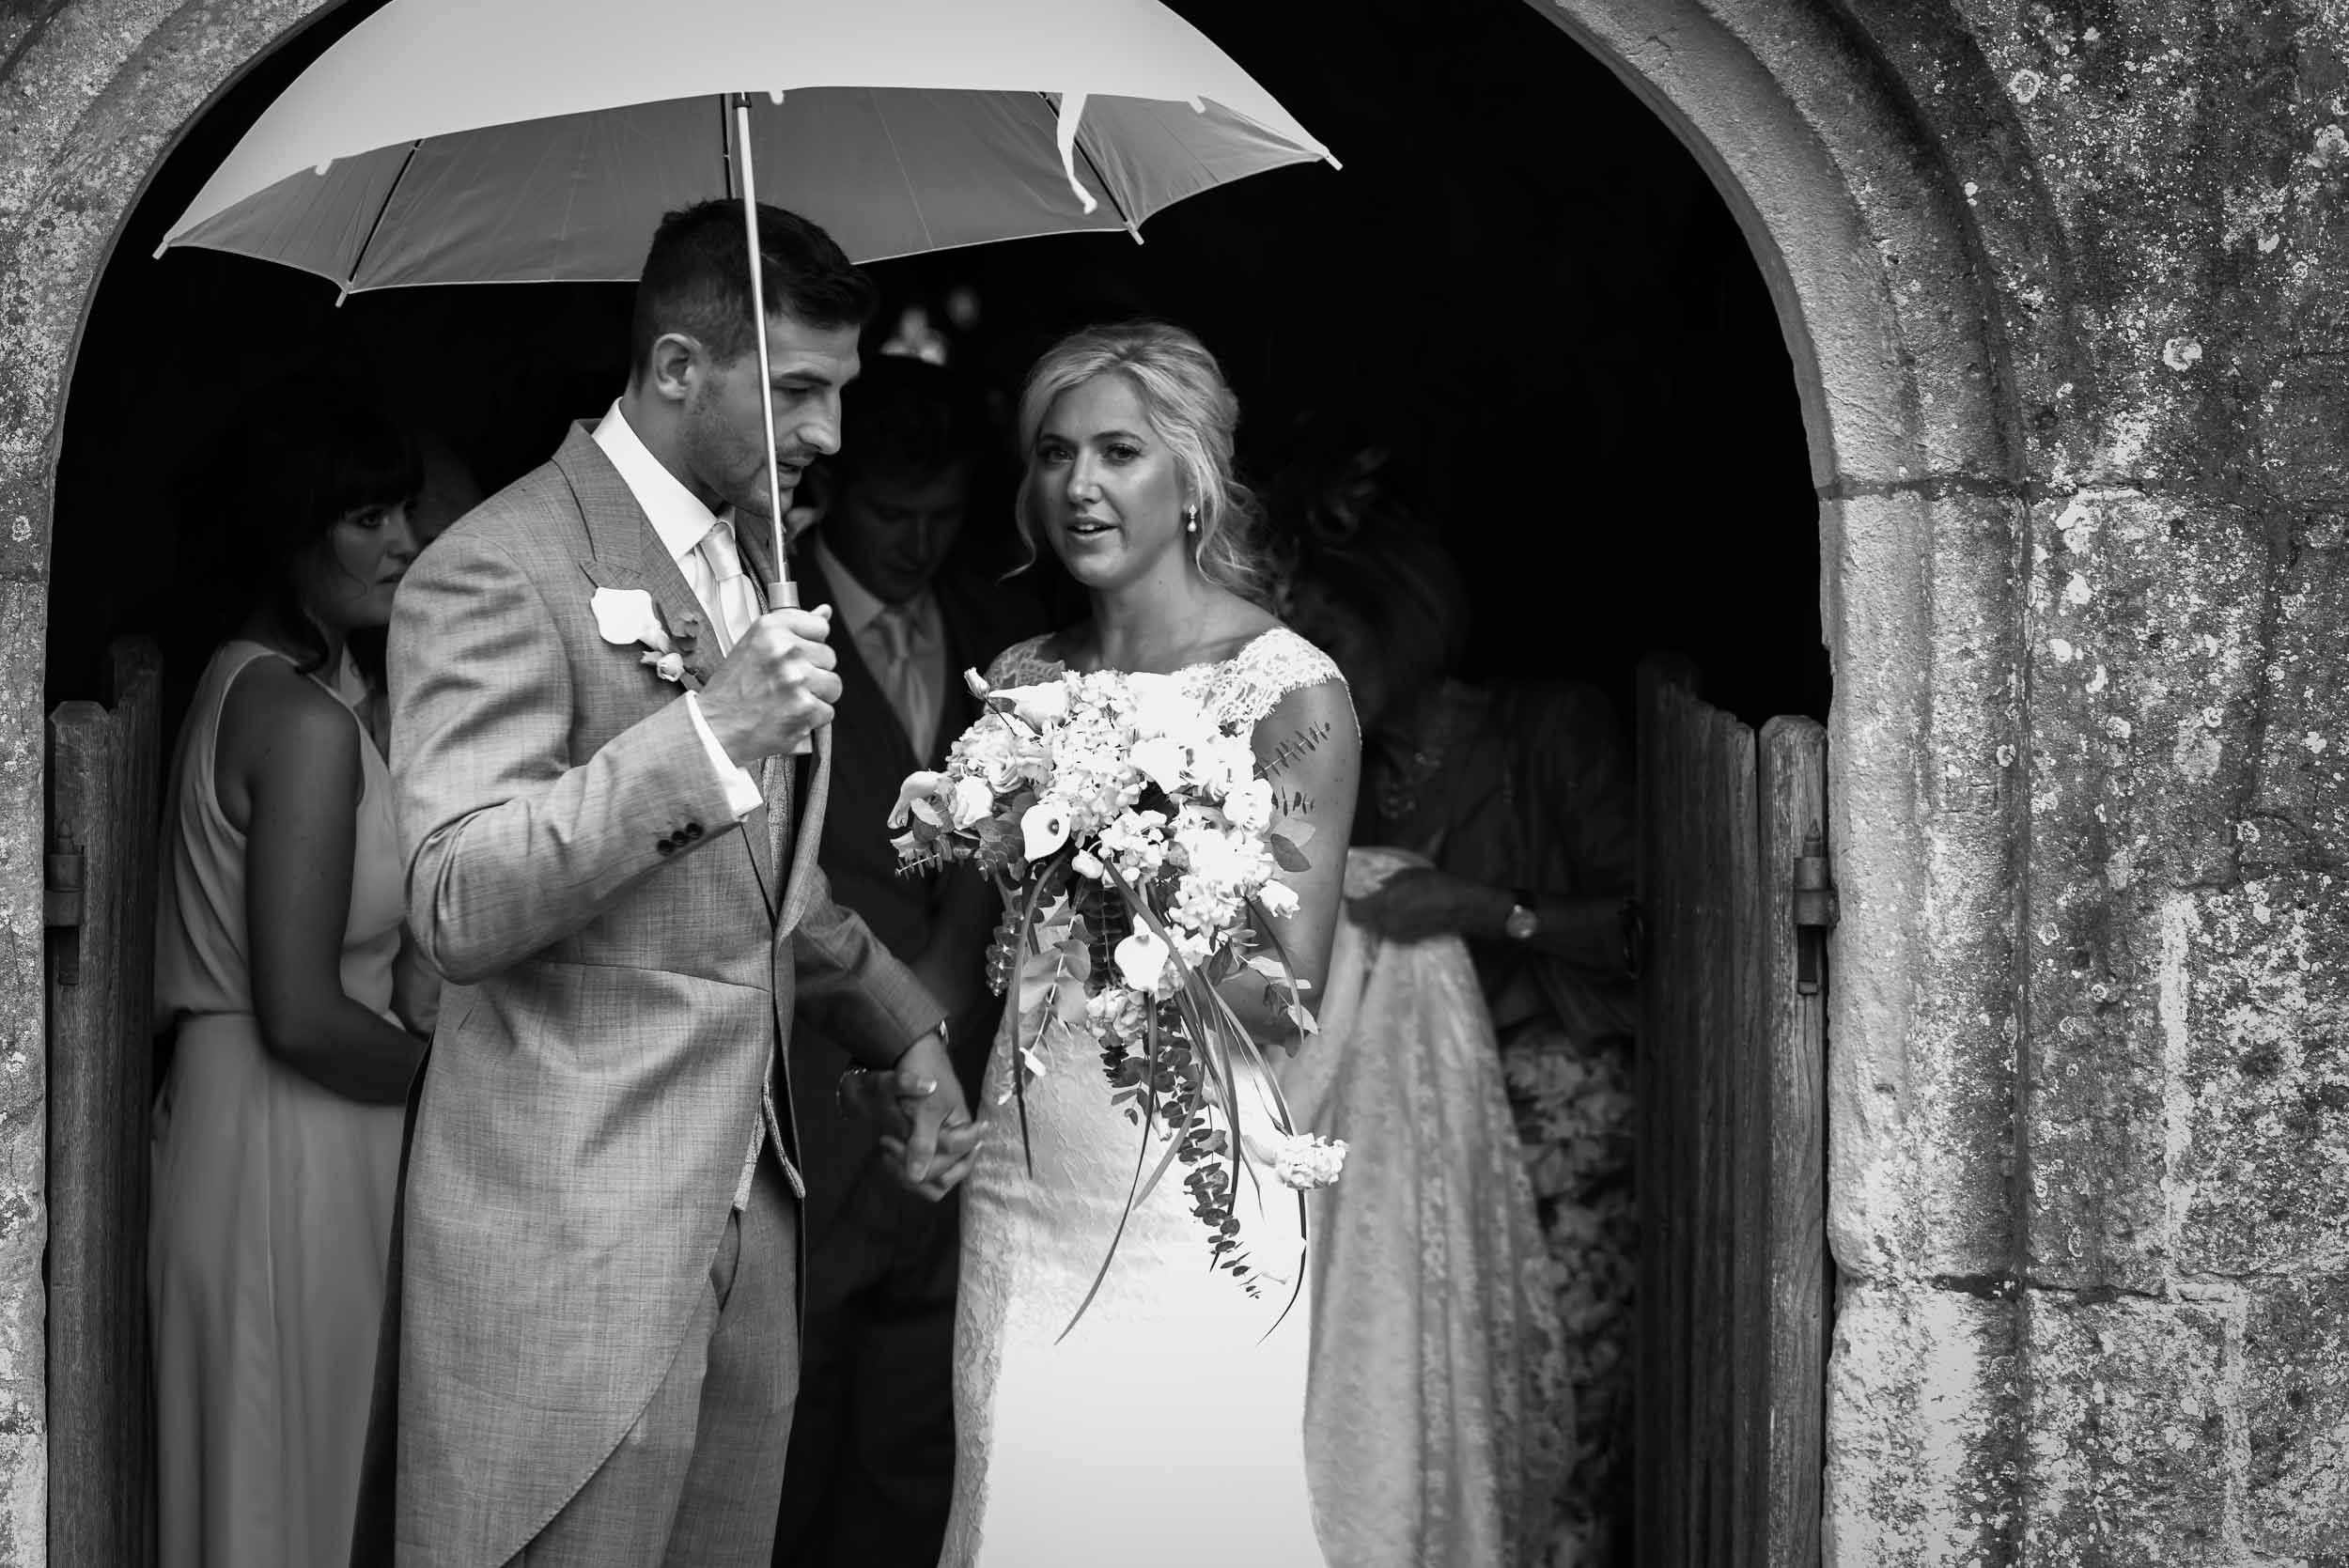 NC-20170722-sophie-and-jonny-wedding-0305.jpg